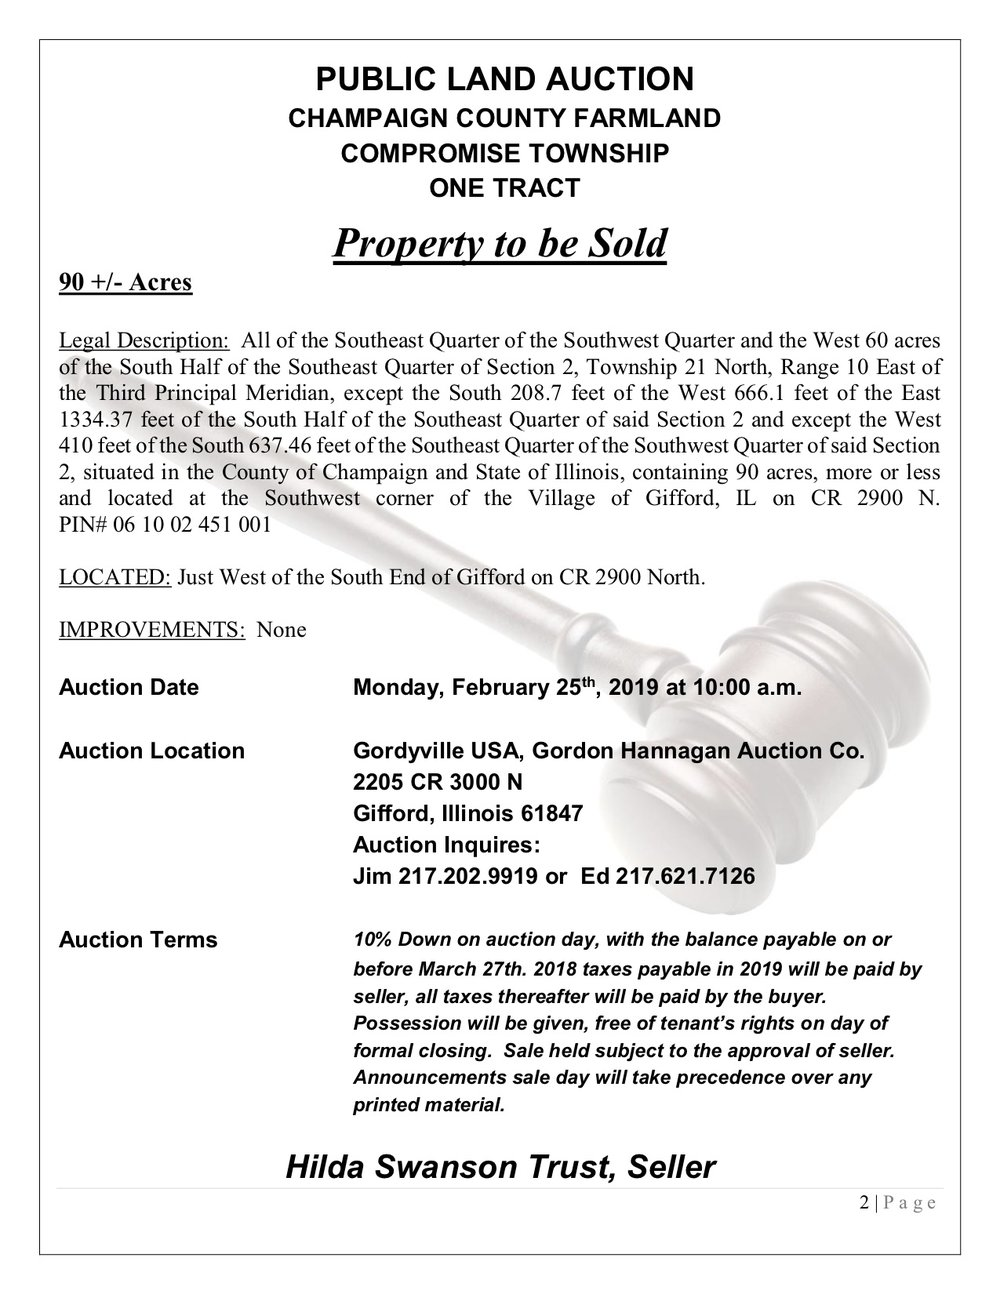 Swanson Day of Sale Brochure.pdf2.jpg